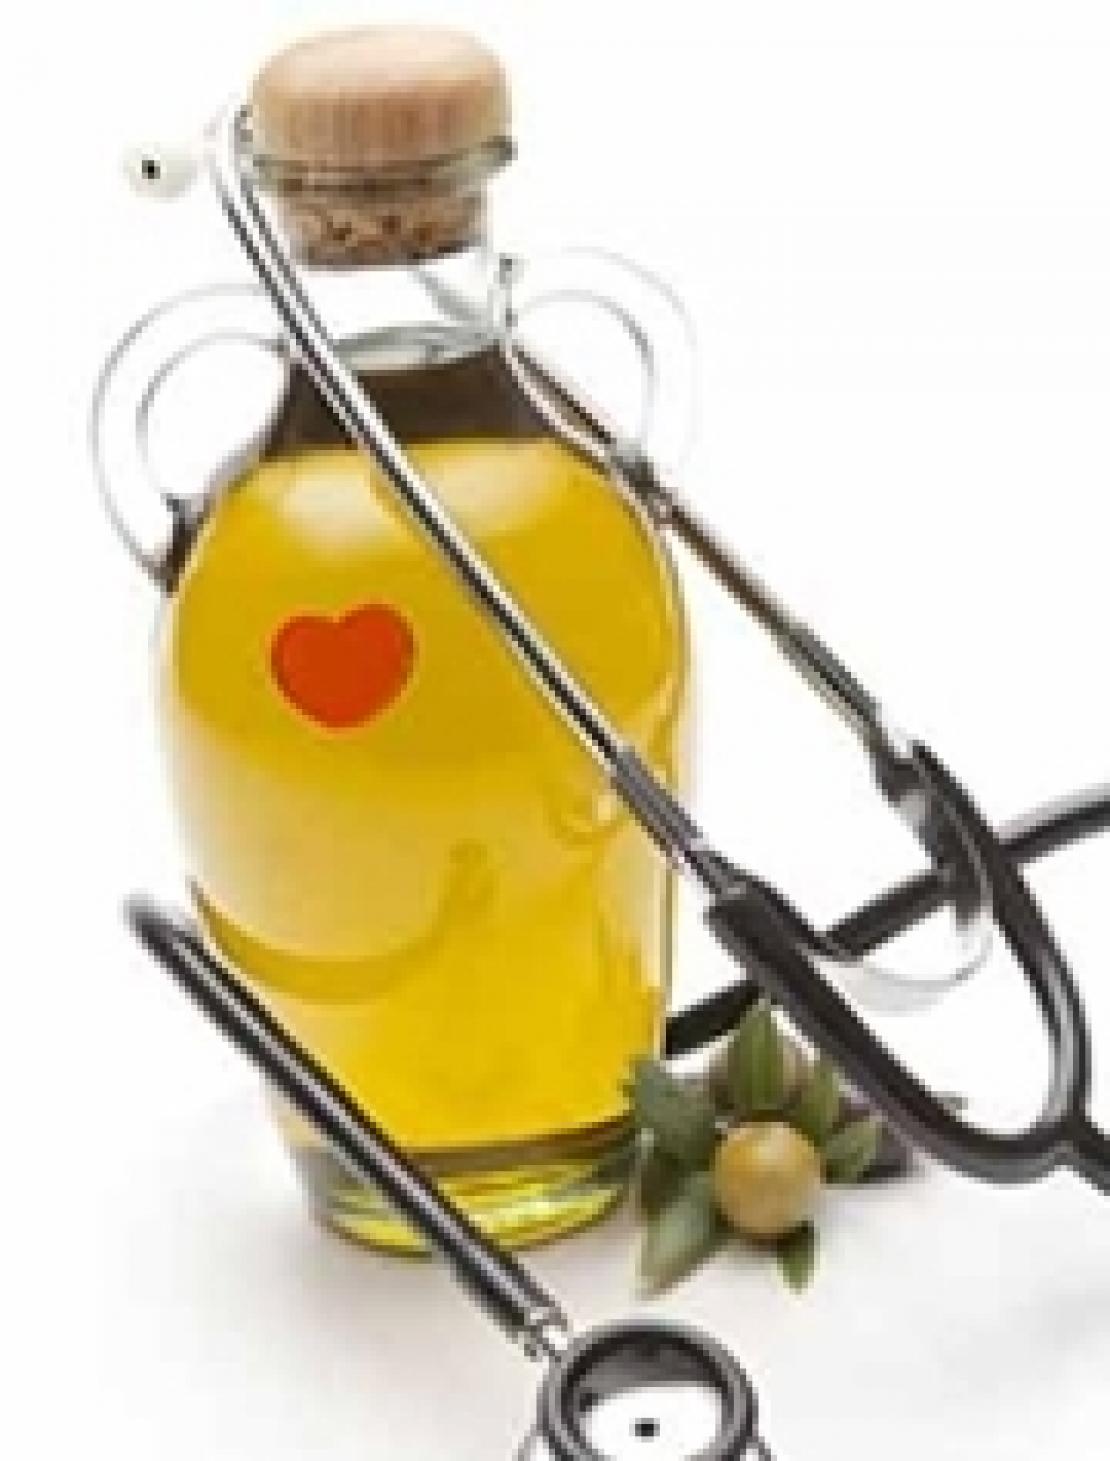 L'olio extra vergine d'oliva è un antidiabetico naturale